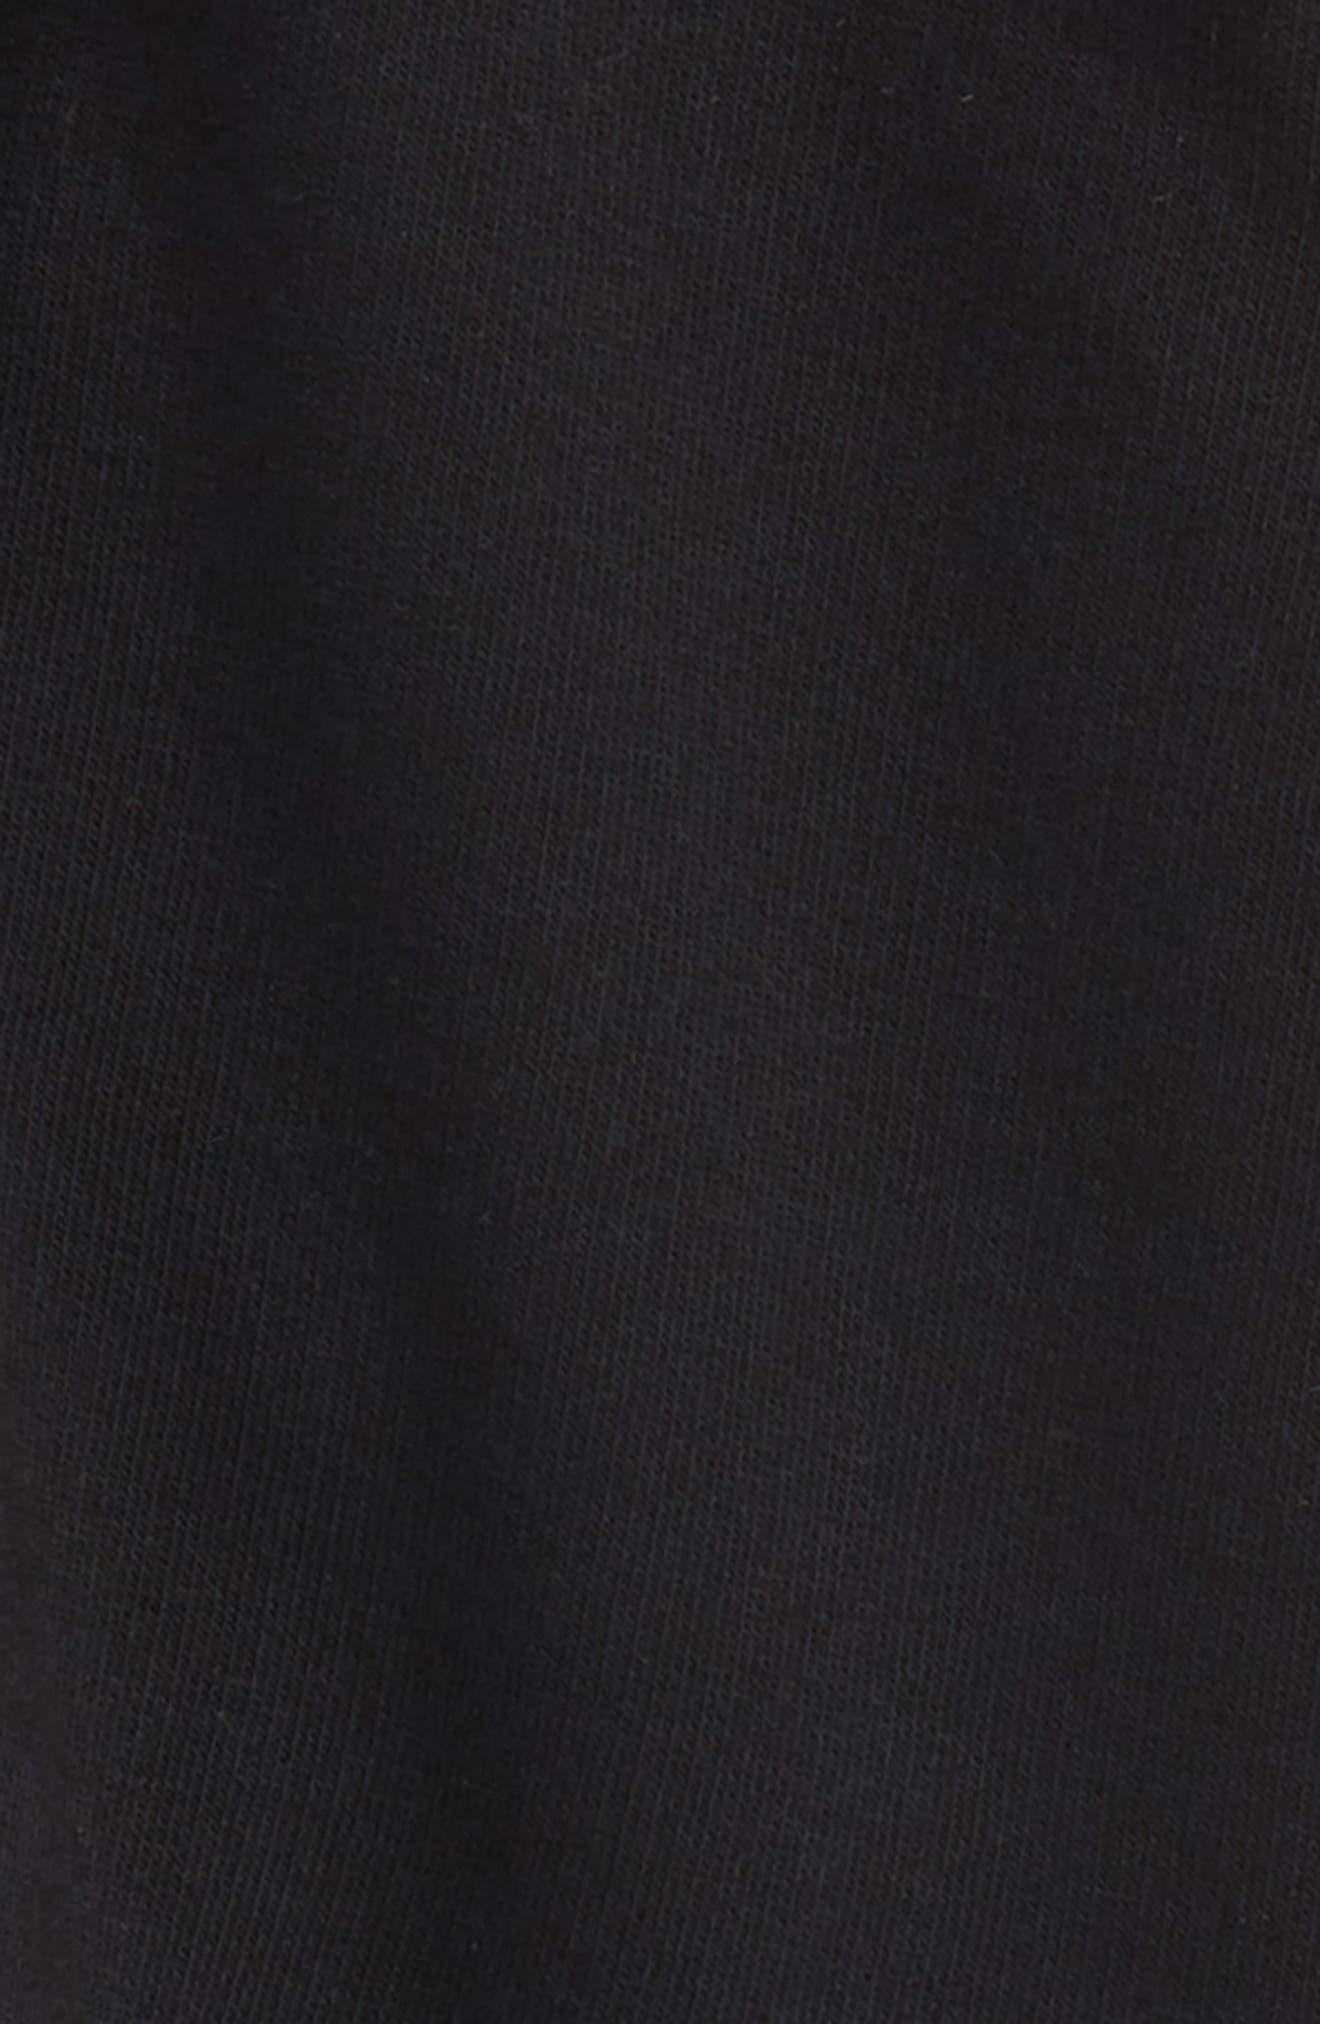 Basic Sweatpants,                             Alternate thumbnail 3, color,                             001